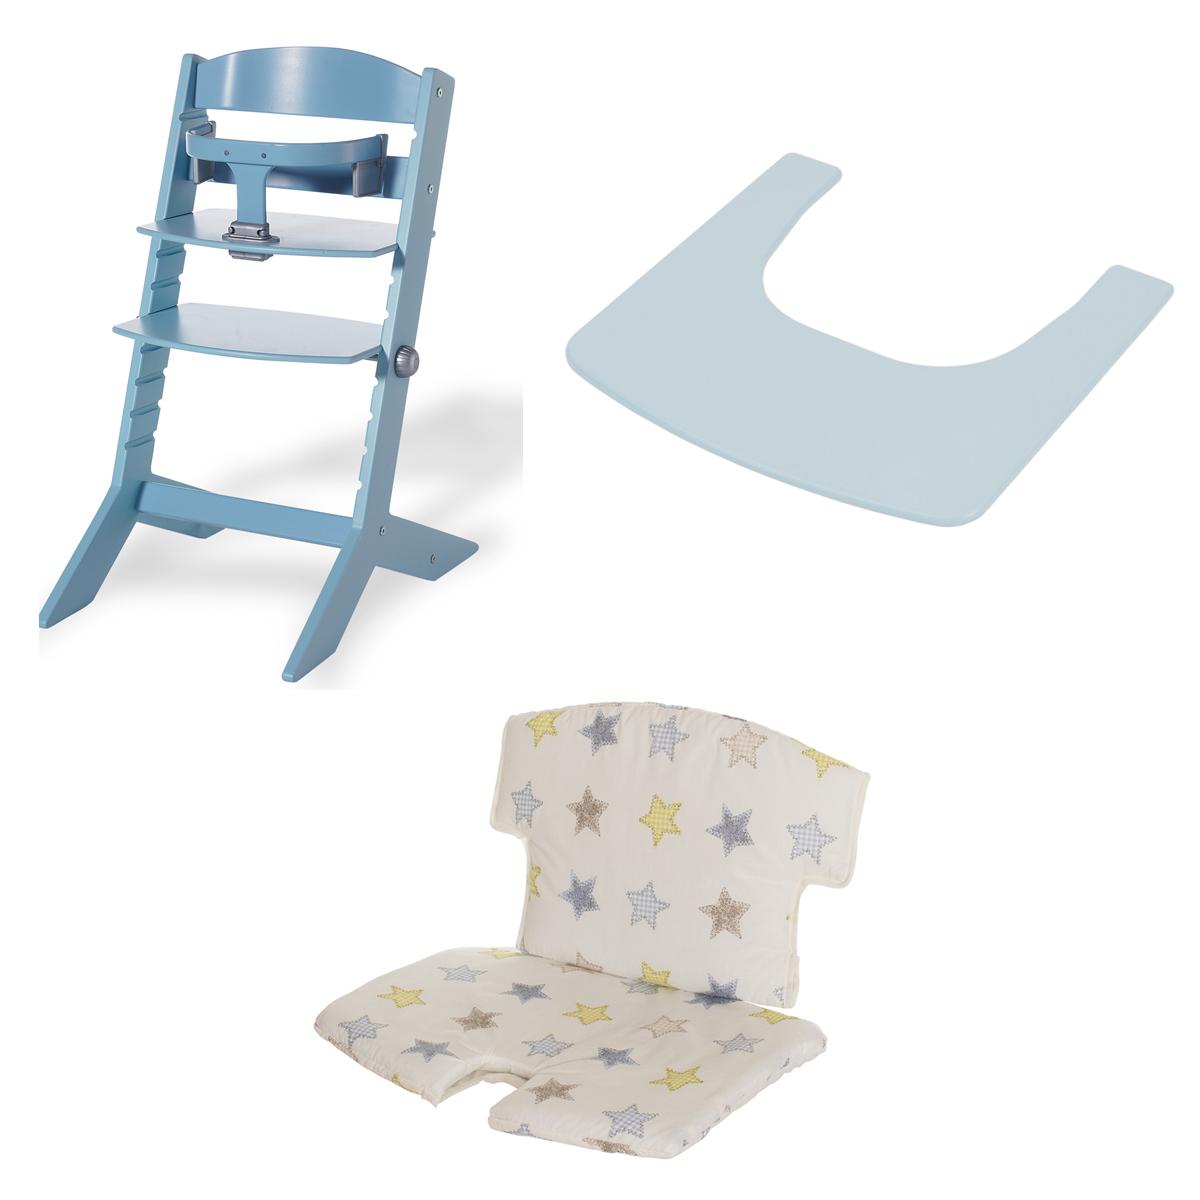 geuther chaise haute syt tablette et coussin de chaise bleu chaise haute geuther sur l. Black Bedroom Furniture Sets. Home Design Ideas